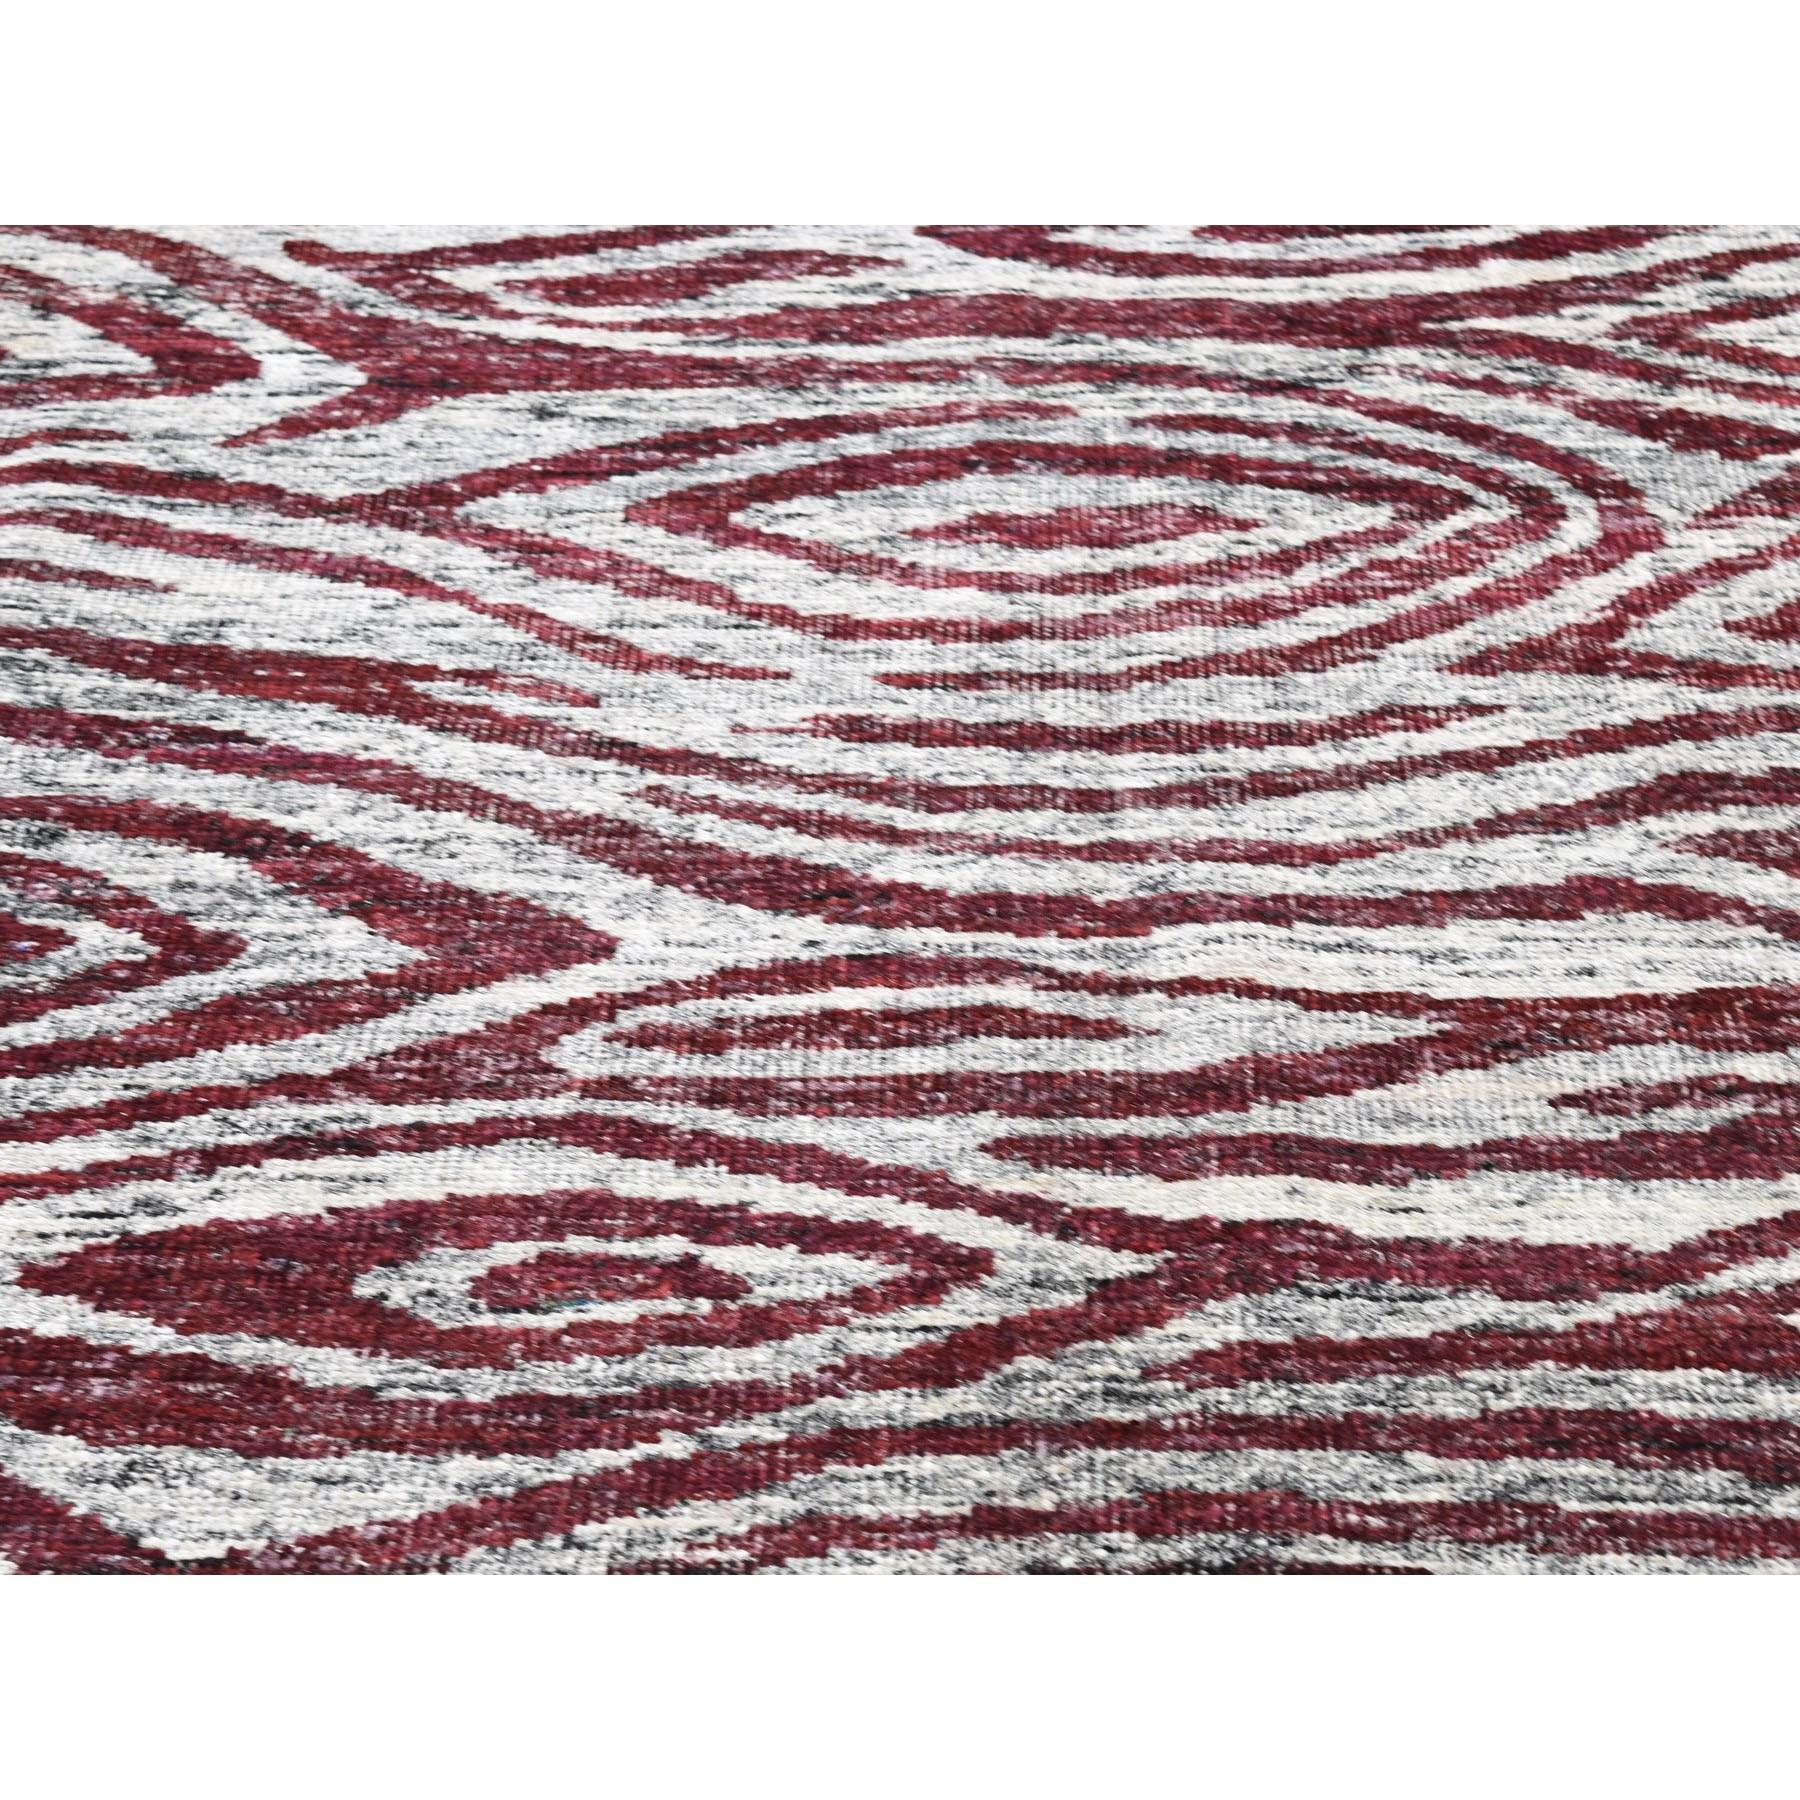 10'x14' Burgundy Modern Sari Silk Hand Knotted Oriental Rug